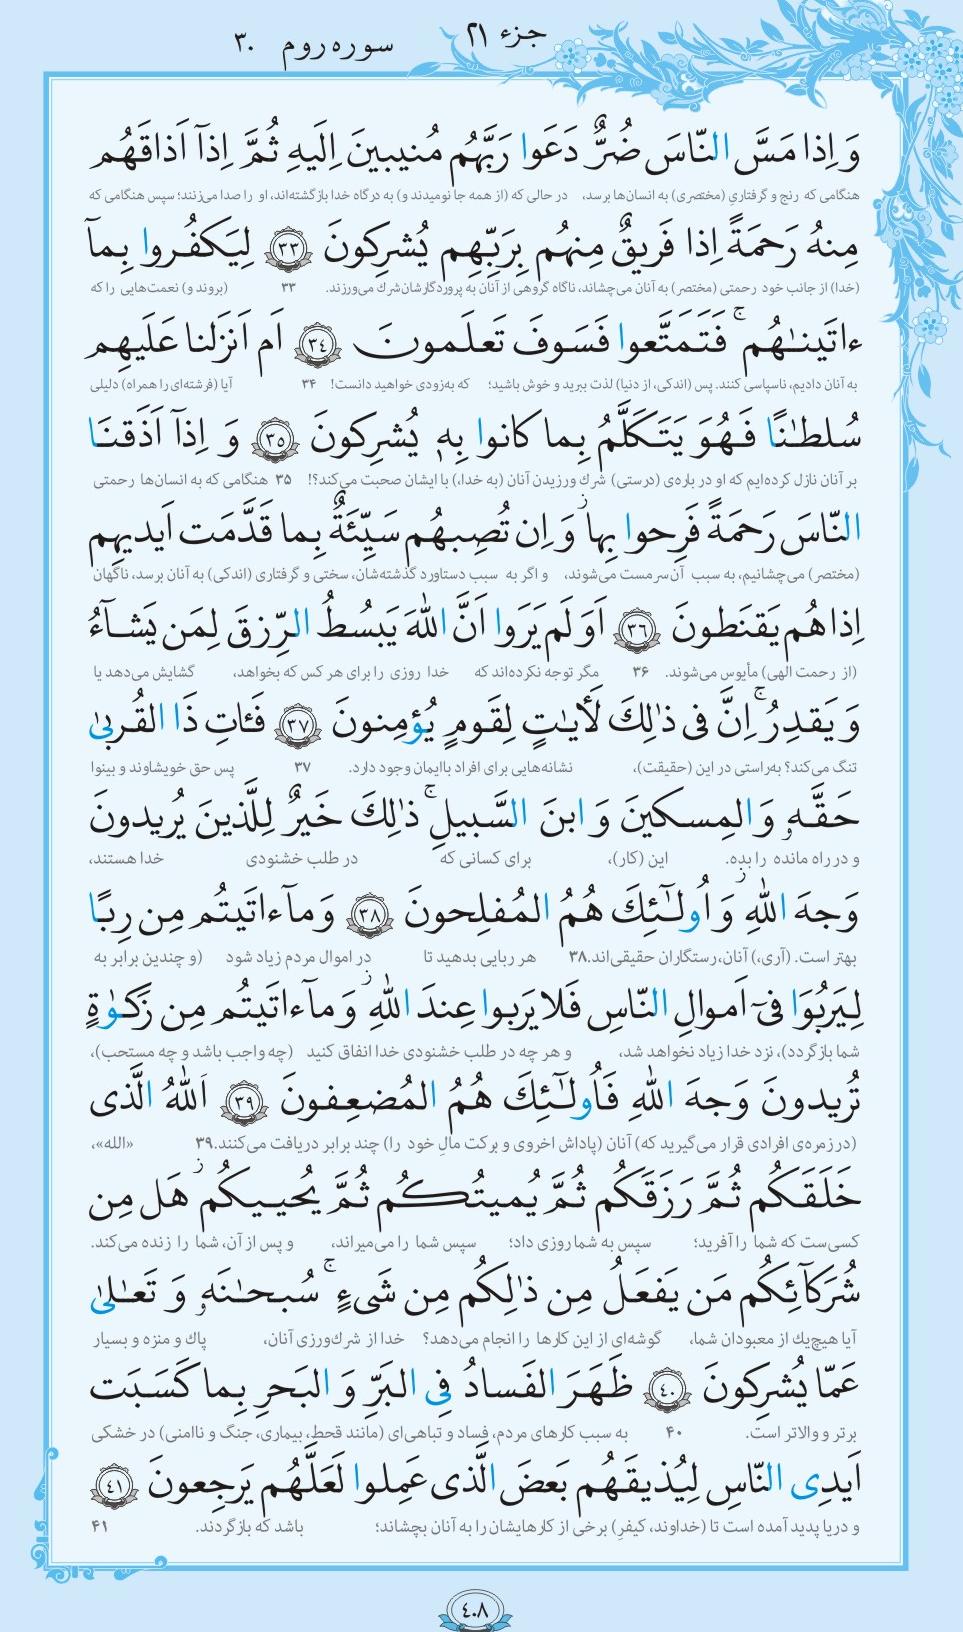 13990410000959 Test NewPhotoFree - ترتیل صفحه ۴۰۸ قرآن باصدای عبدالباسط+صوت و متن